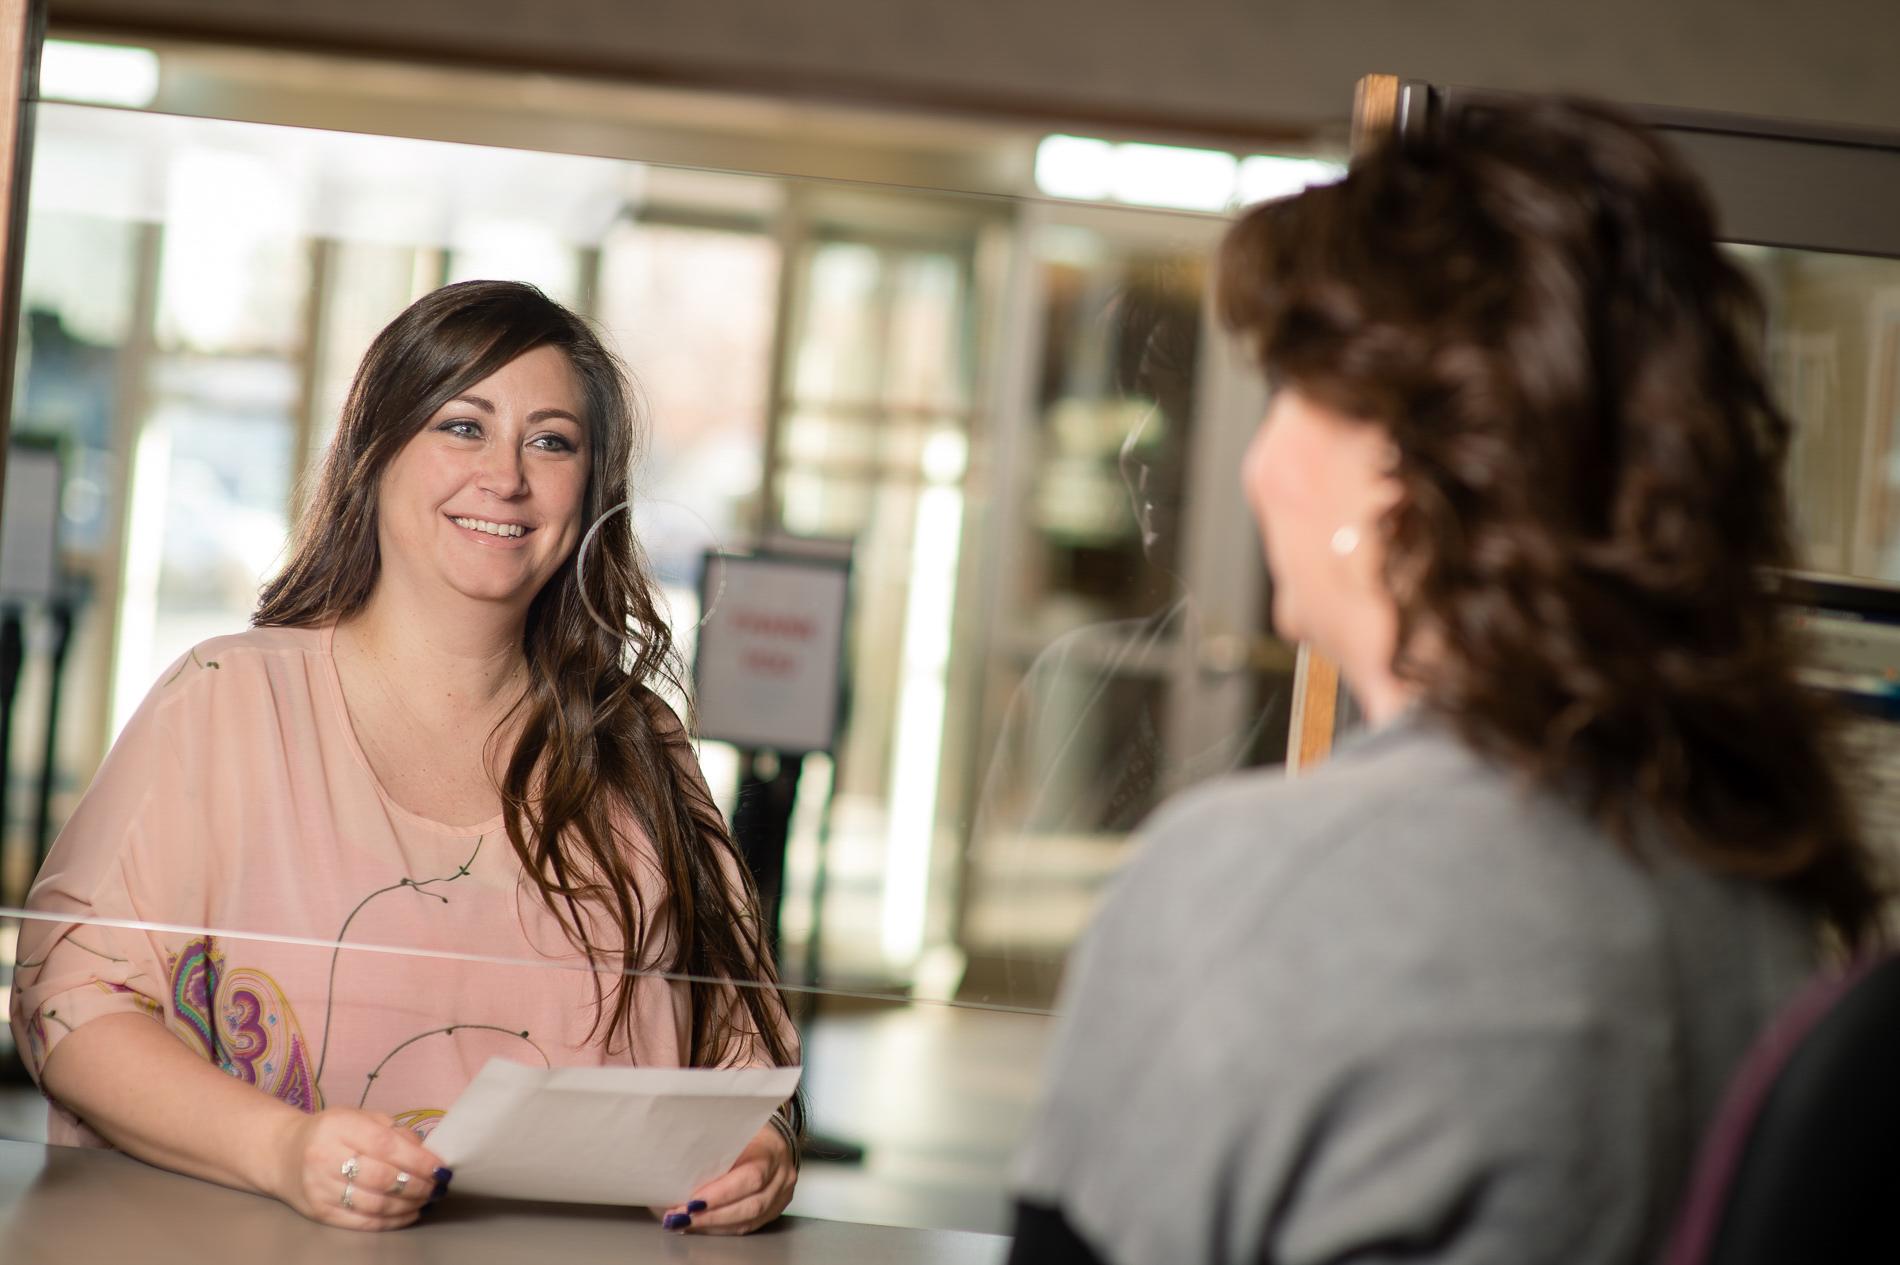 Customer Service Photography